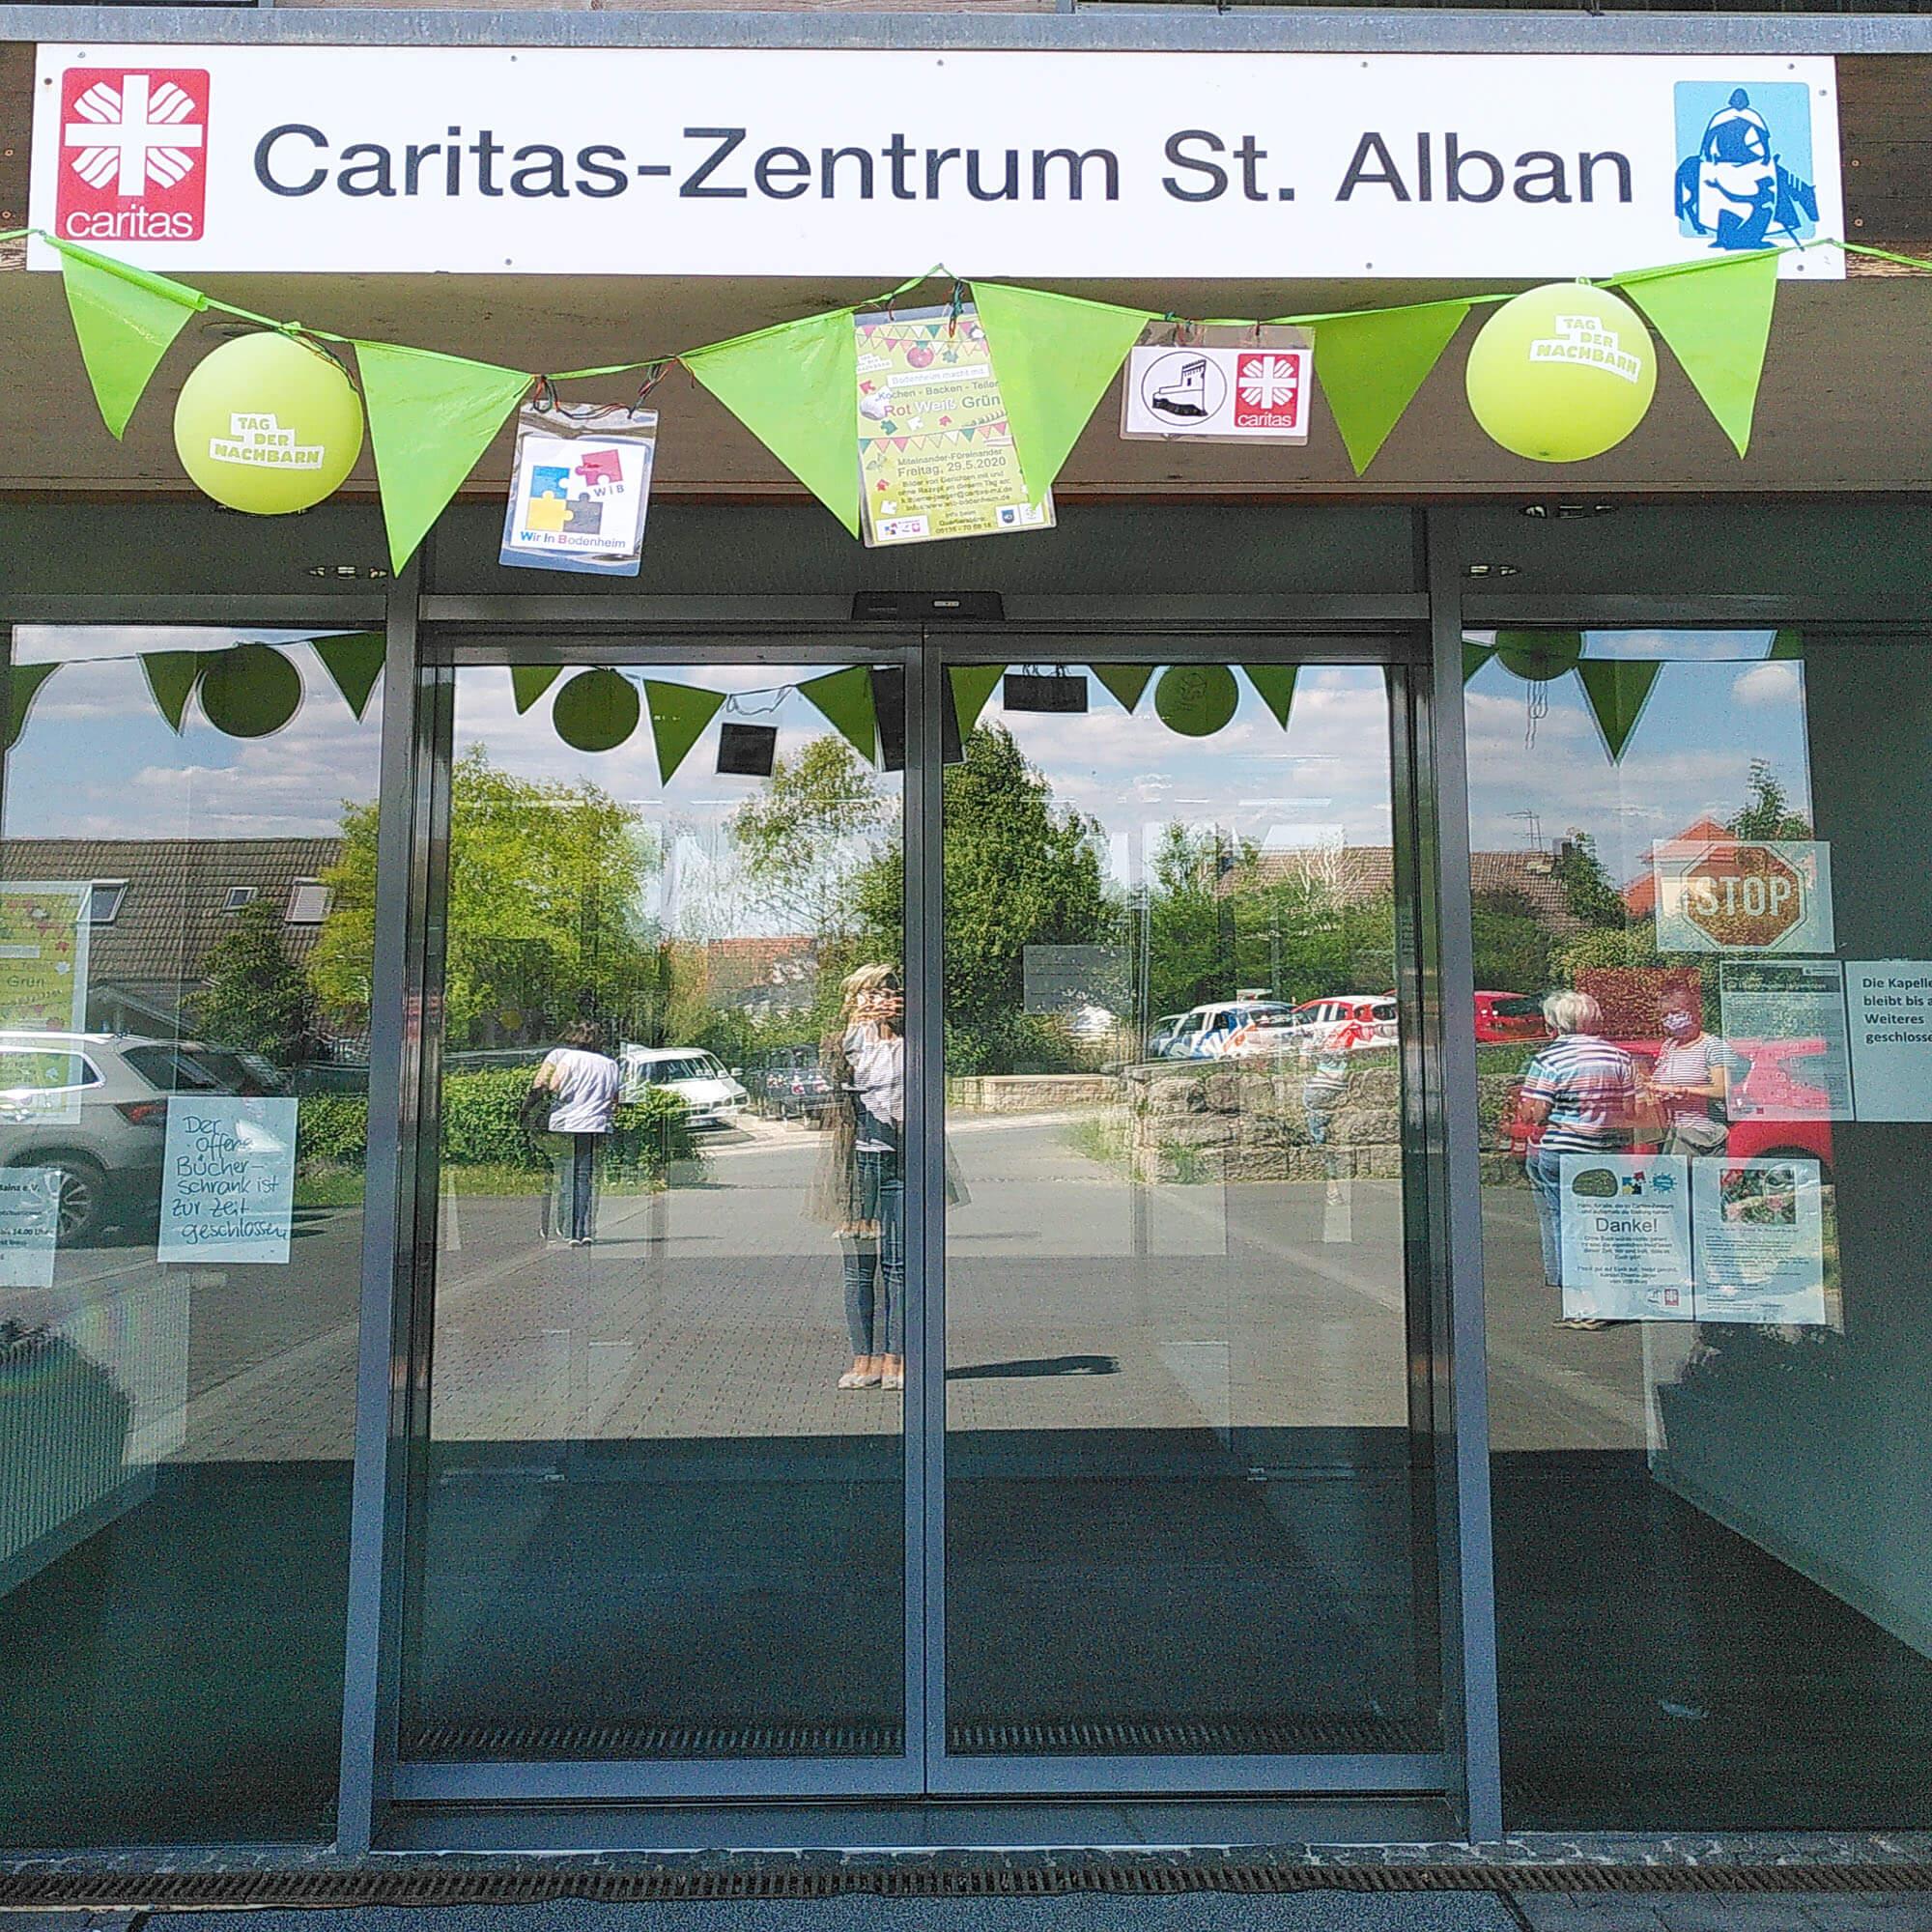 14a_Caritas-Zentrum St.Alban, Girlande